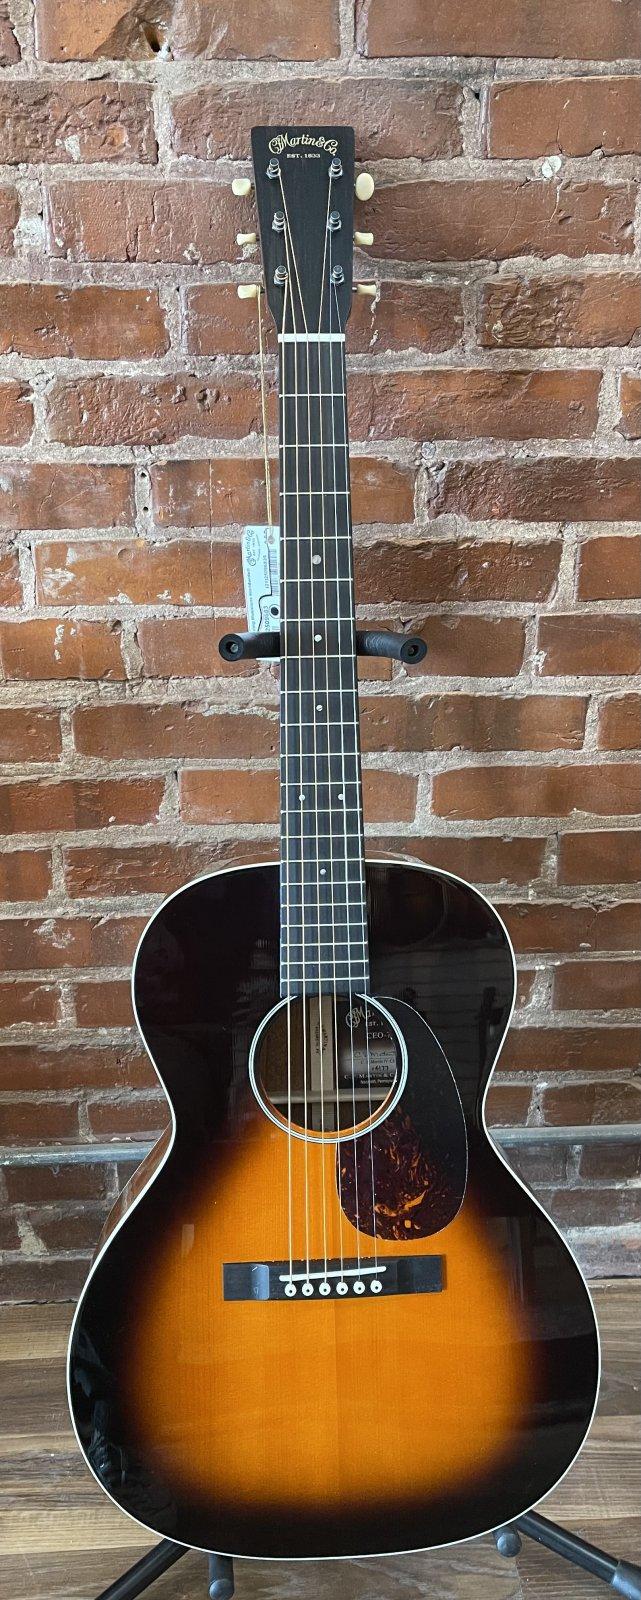 Martin CEO-7 Acoustic Guitar